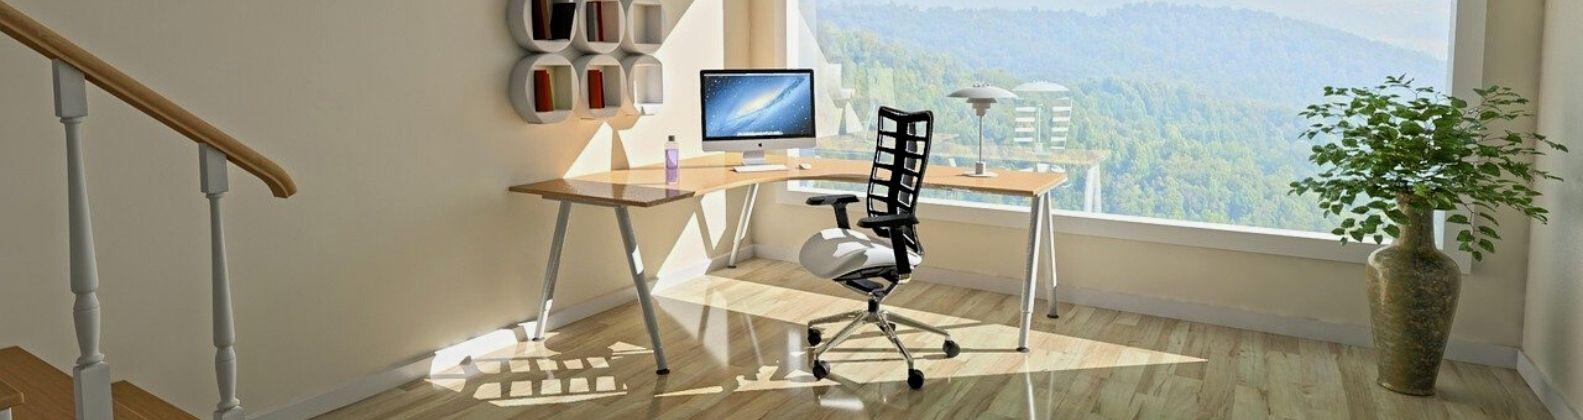 mejores sillas ergonómicas de oficina 2021